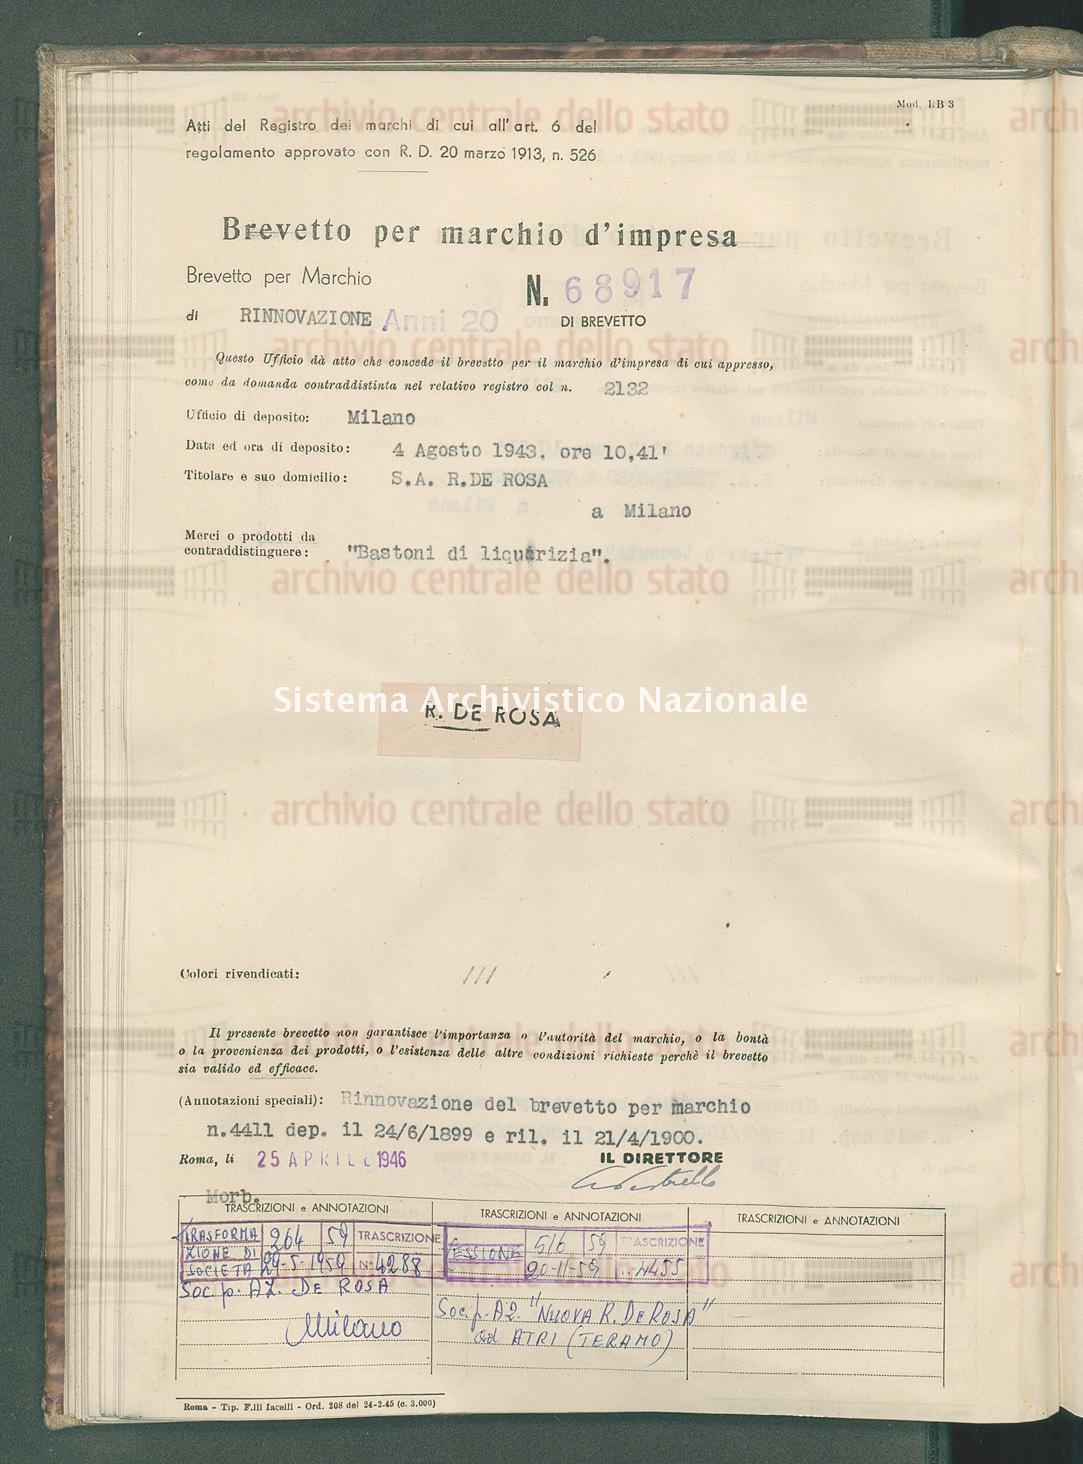 'Bastoni di liquirizia' S.A. R. De Rosa (25/04/1946)